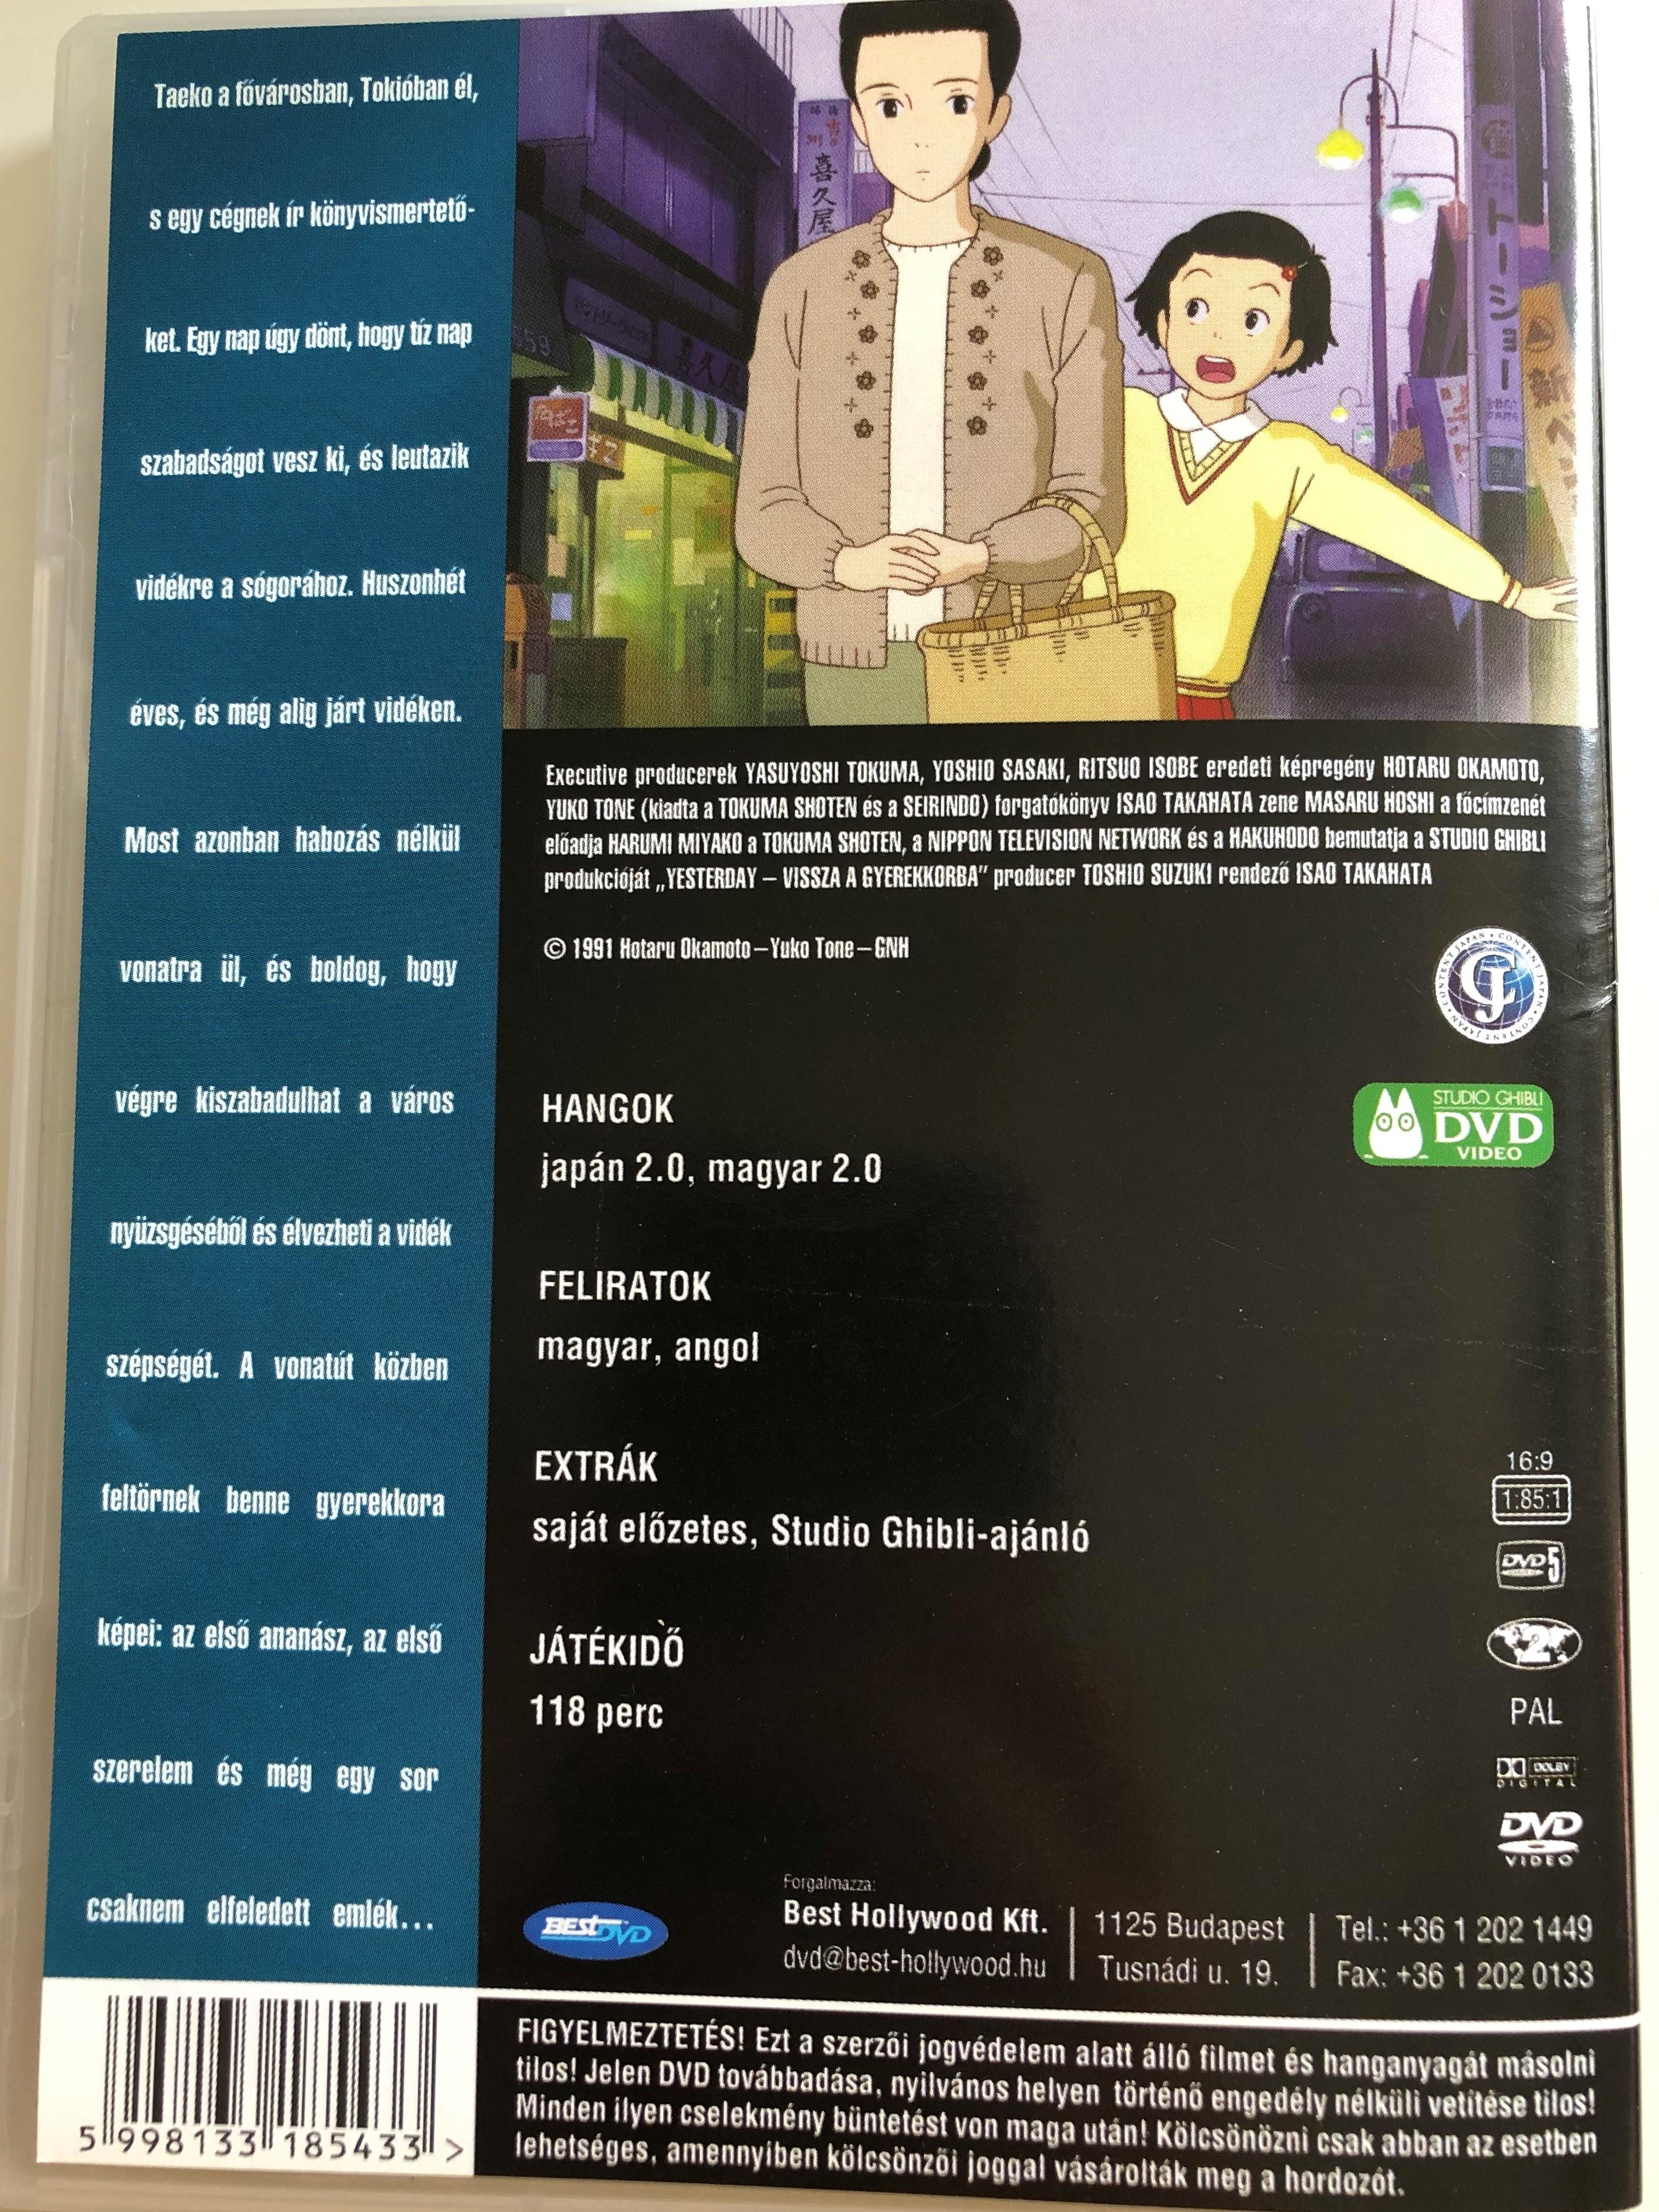 only-yesterday-dvd-1991-yesterday-vissza-a-gyerekkorba-directed-by-isao-takahata-starring-miki-imai-toshir-yanagiba-y-ko-honna-studio-ghibli-japanese-animated-film-omoide-poro-poro-2-.jpg